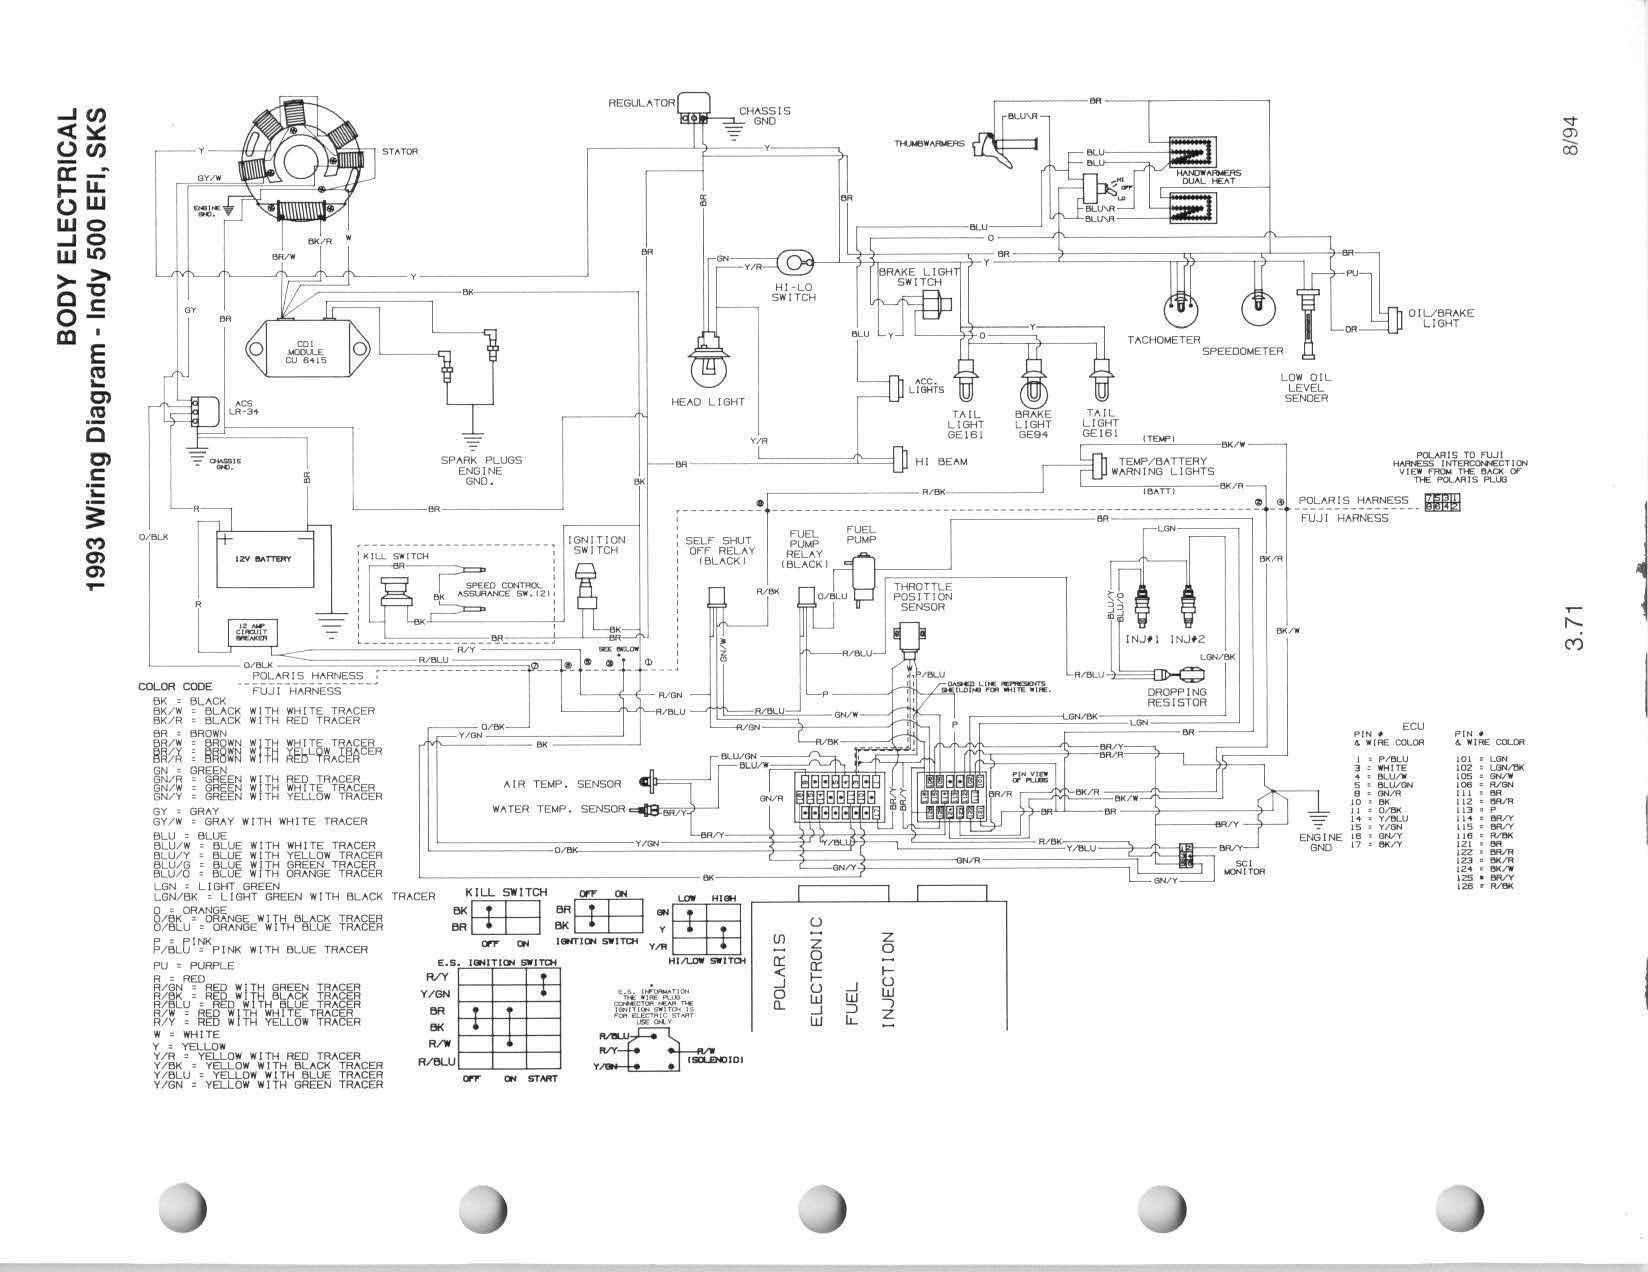 medium resolution of image result for battery wiring diagram for 2008 polaris atv 2008 polaris sportsman 500 ho wiring diagram 2008 polaris wiring diagram